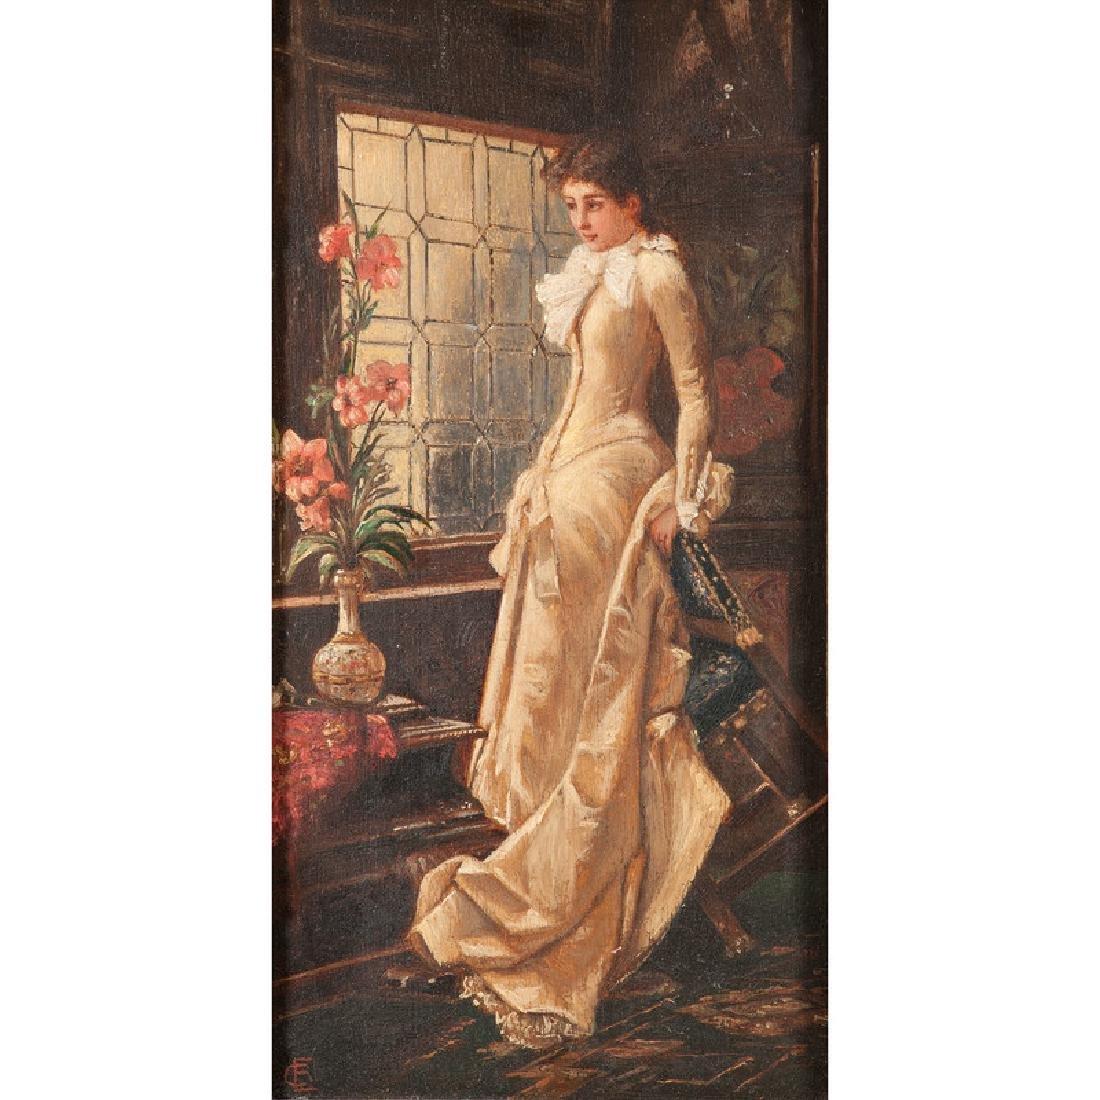 Portrait of a Woman by E. Lang